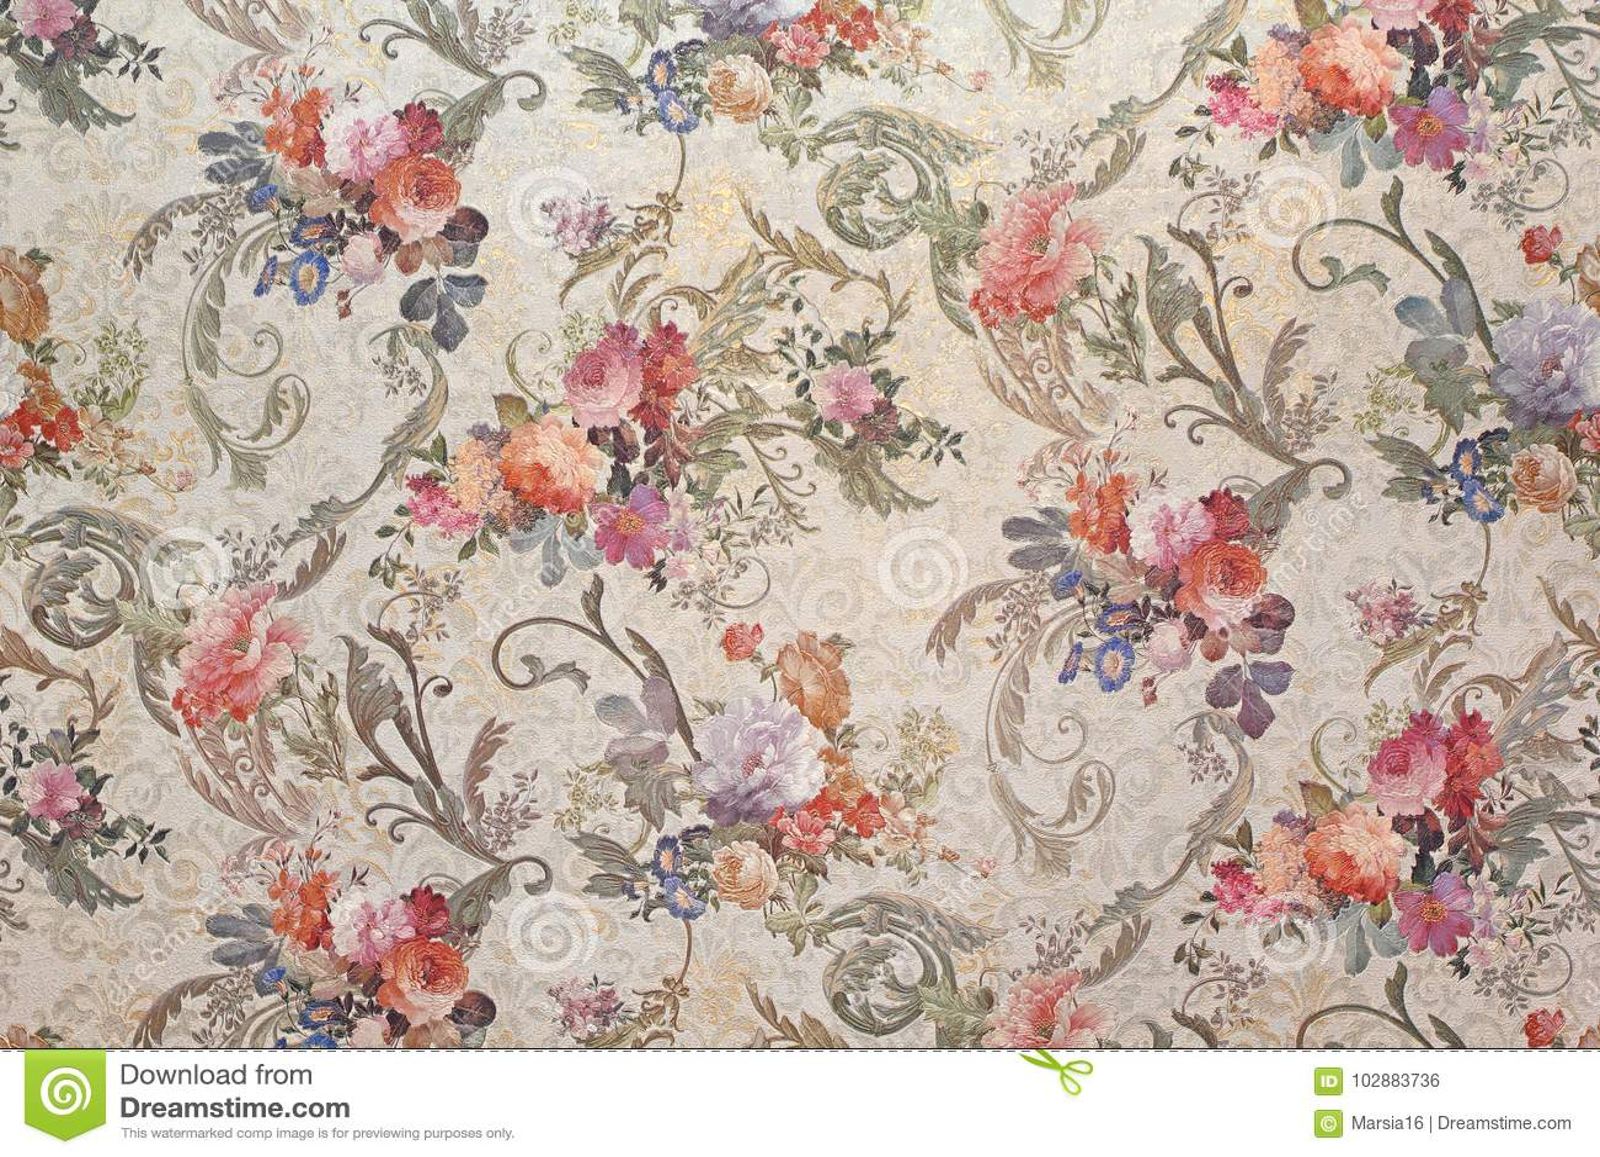 Vintage Floral Wallpaper Stock Photo Image Of Background 102883736